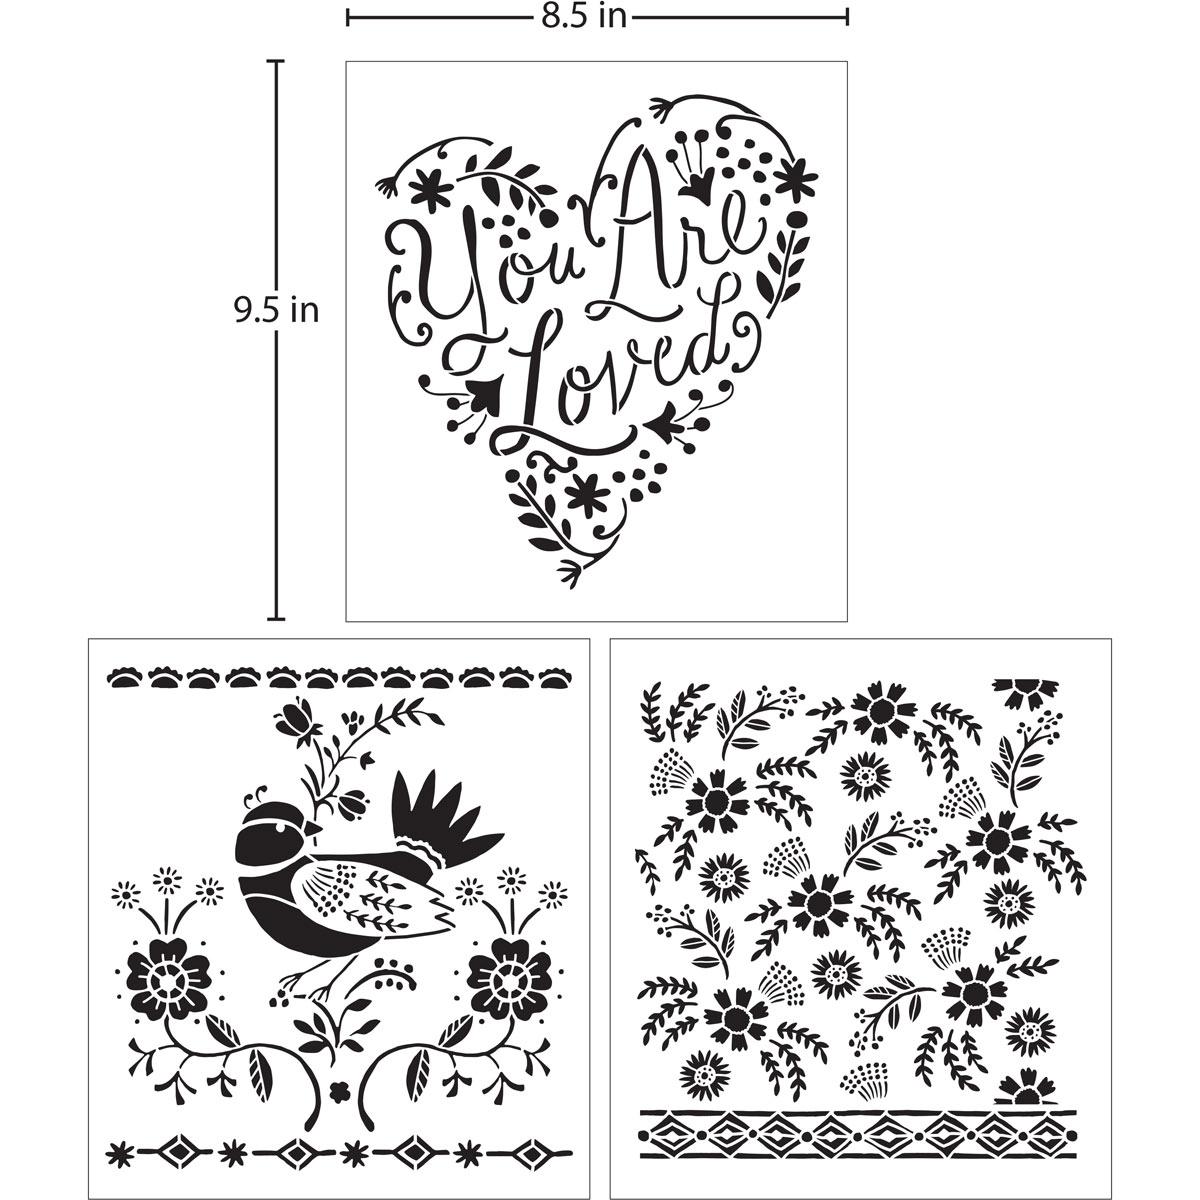 Hallmark Handcrafted Adhesive Stencils - Happy Script Design Pack, 8-1/2